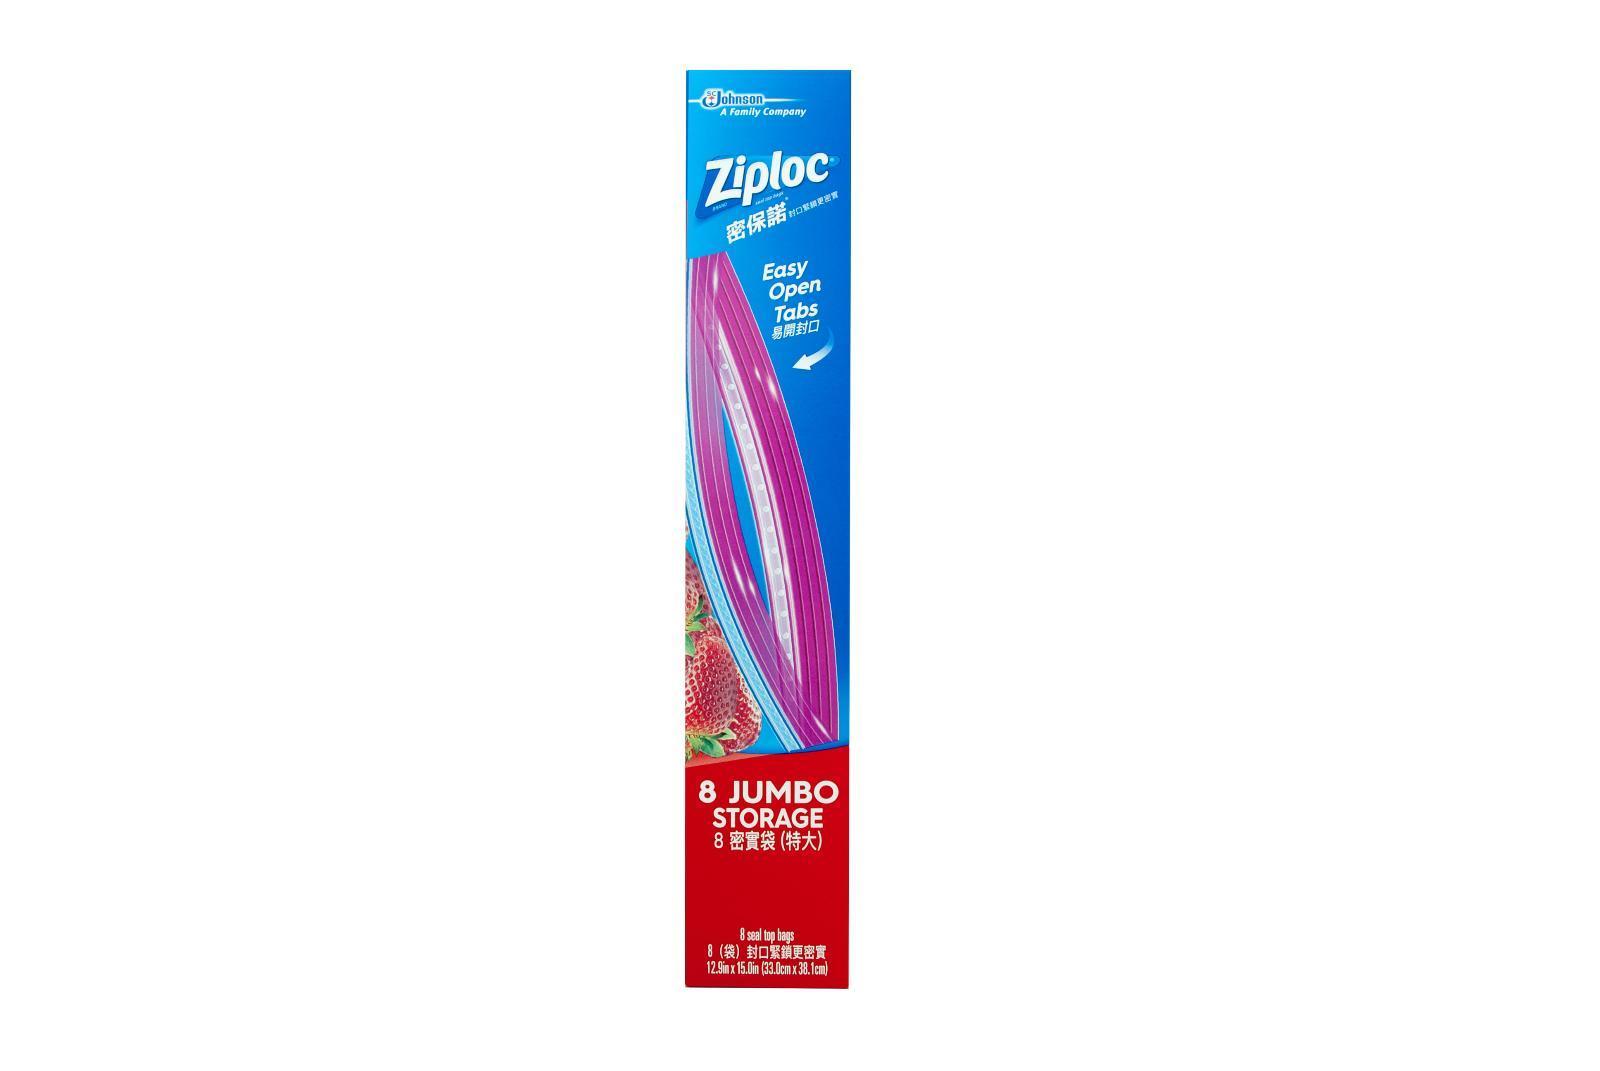 Ziploc Jumbo Storage Bags 33.0x39.7cm By Redmart.